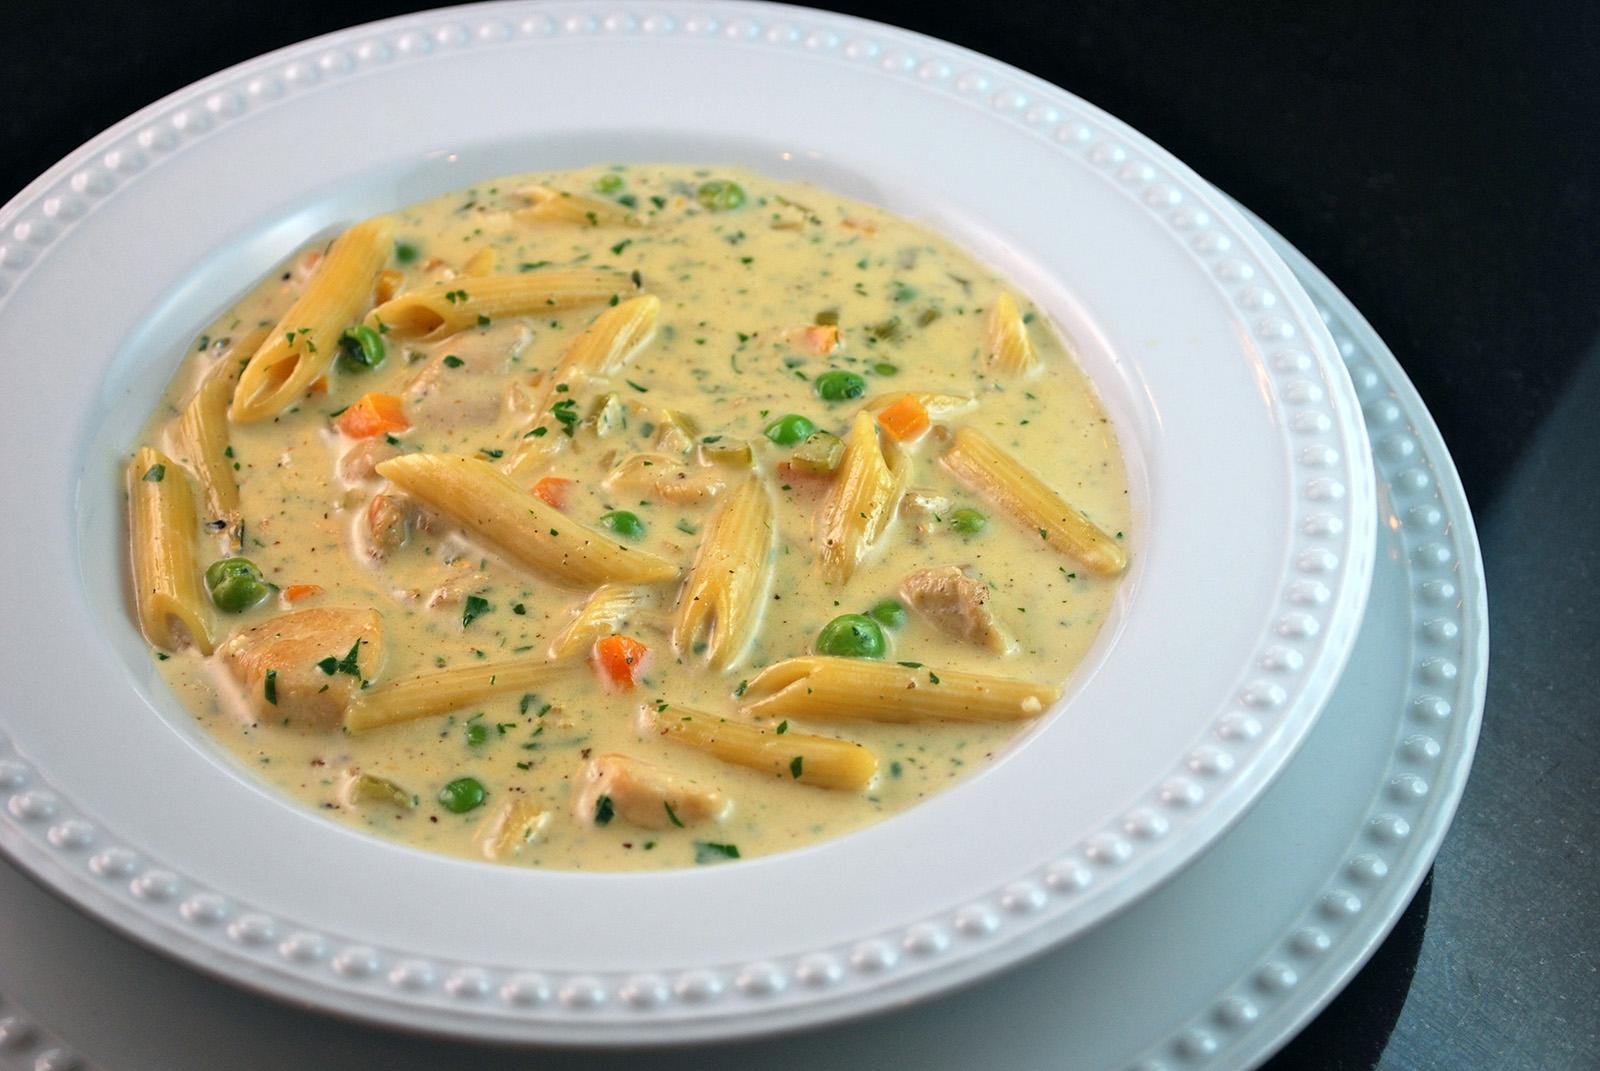 Creamy pasta chicken soup